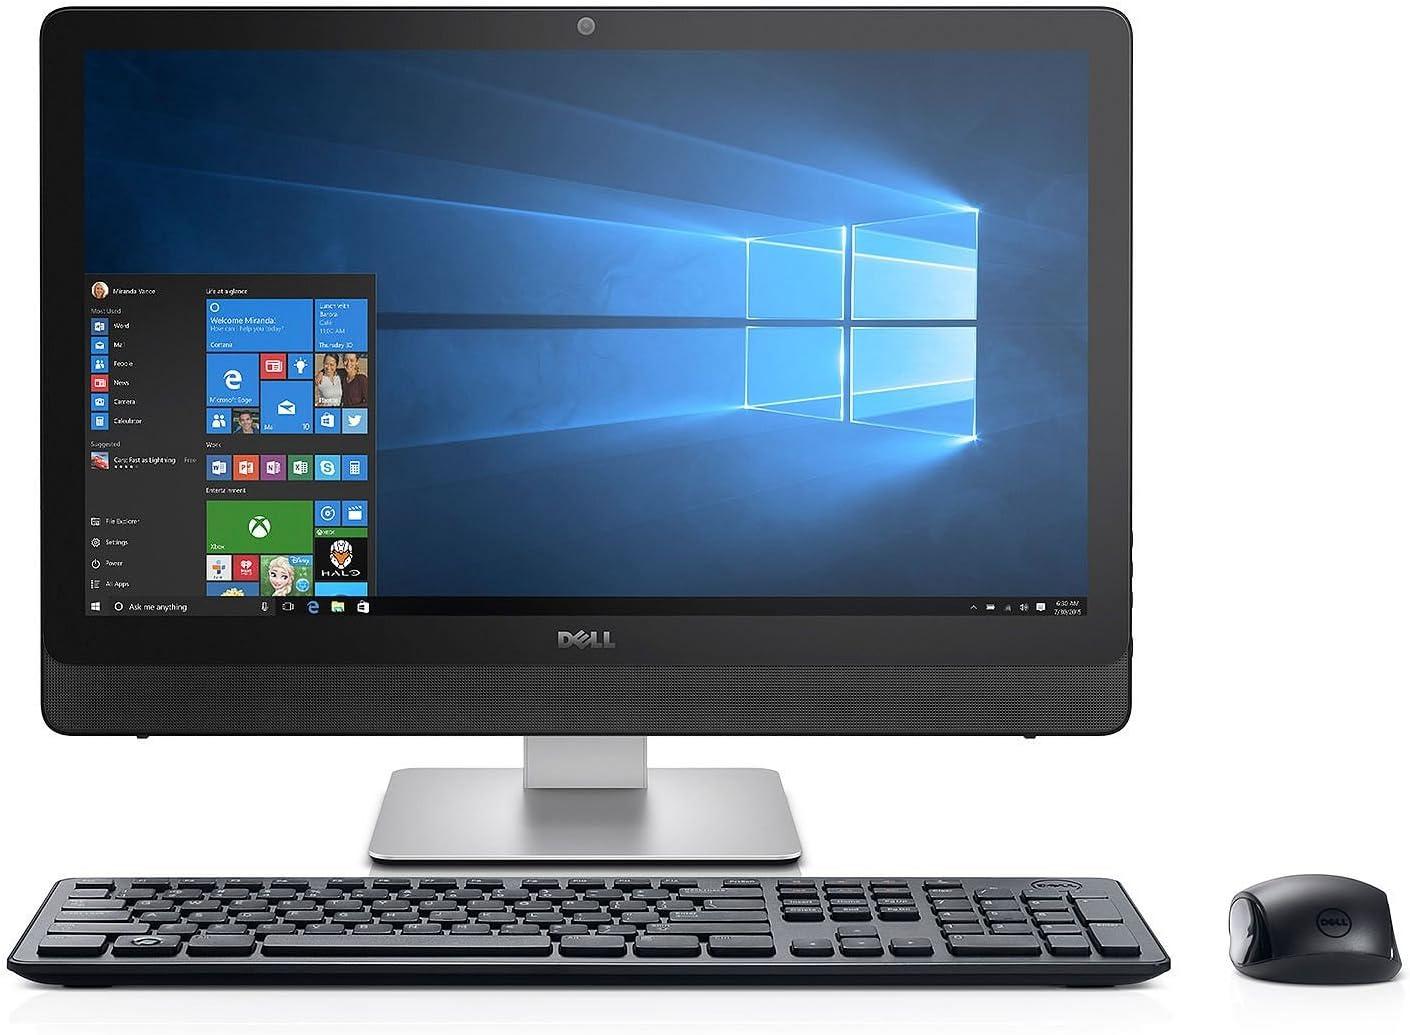 "2018 Dell Inspiron 23.8"" Full HD Touchscreen 1920x1080 All-in-One Desktop -Intel Core i7-7500u, 12GB DDR4 RAM, 1TB HDD, Intel HD 620 Graphics, HDMI, Bluetooth, 802.11AC WiFi, Windows 10"